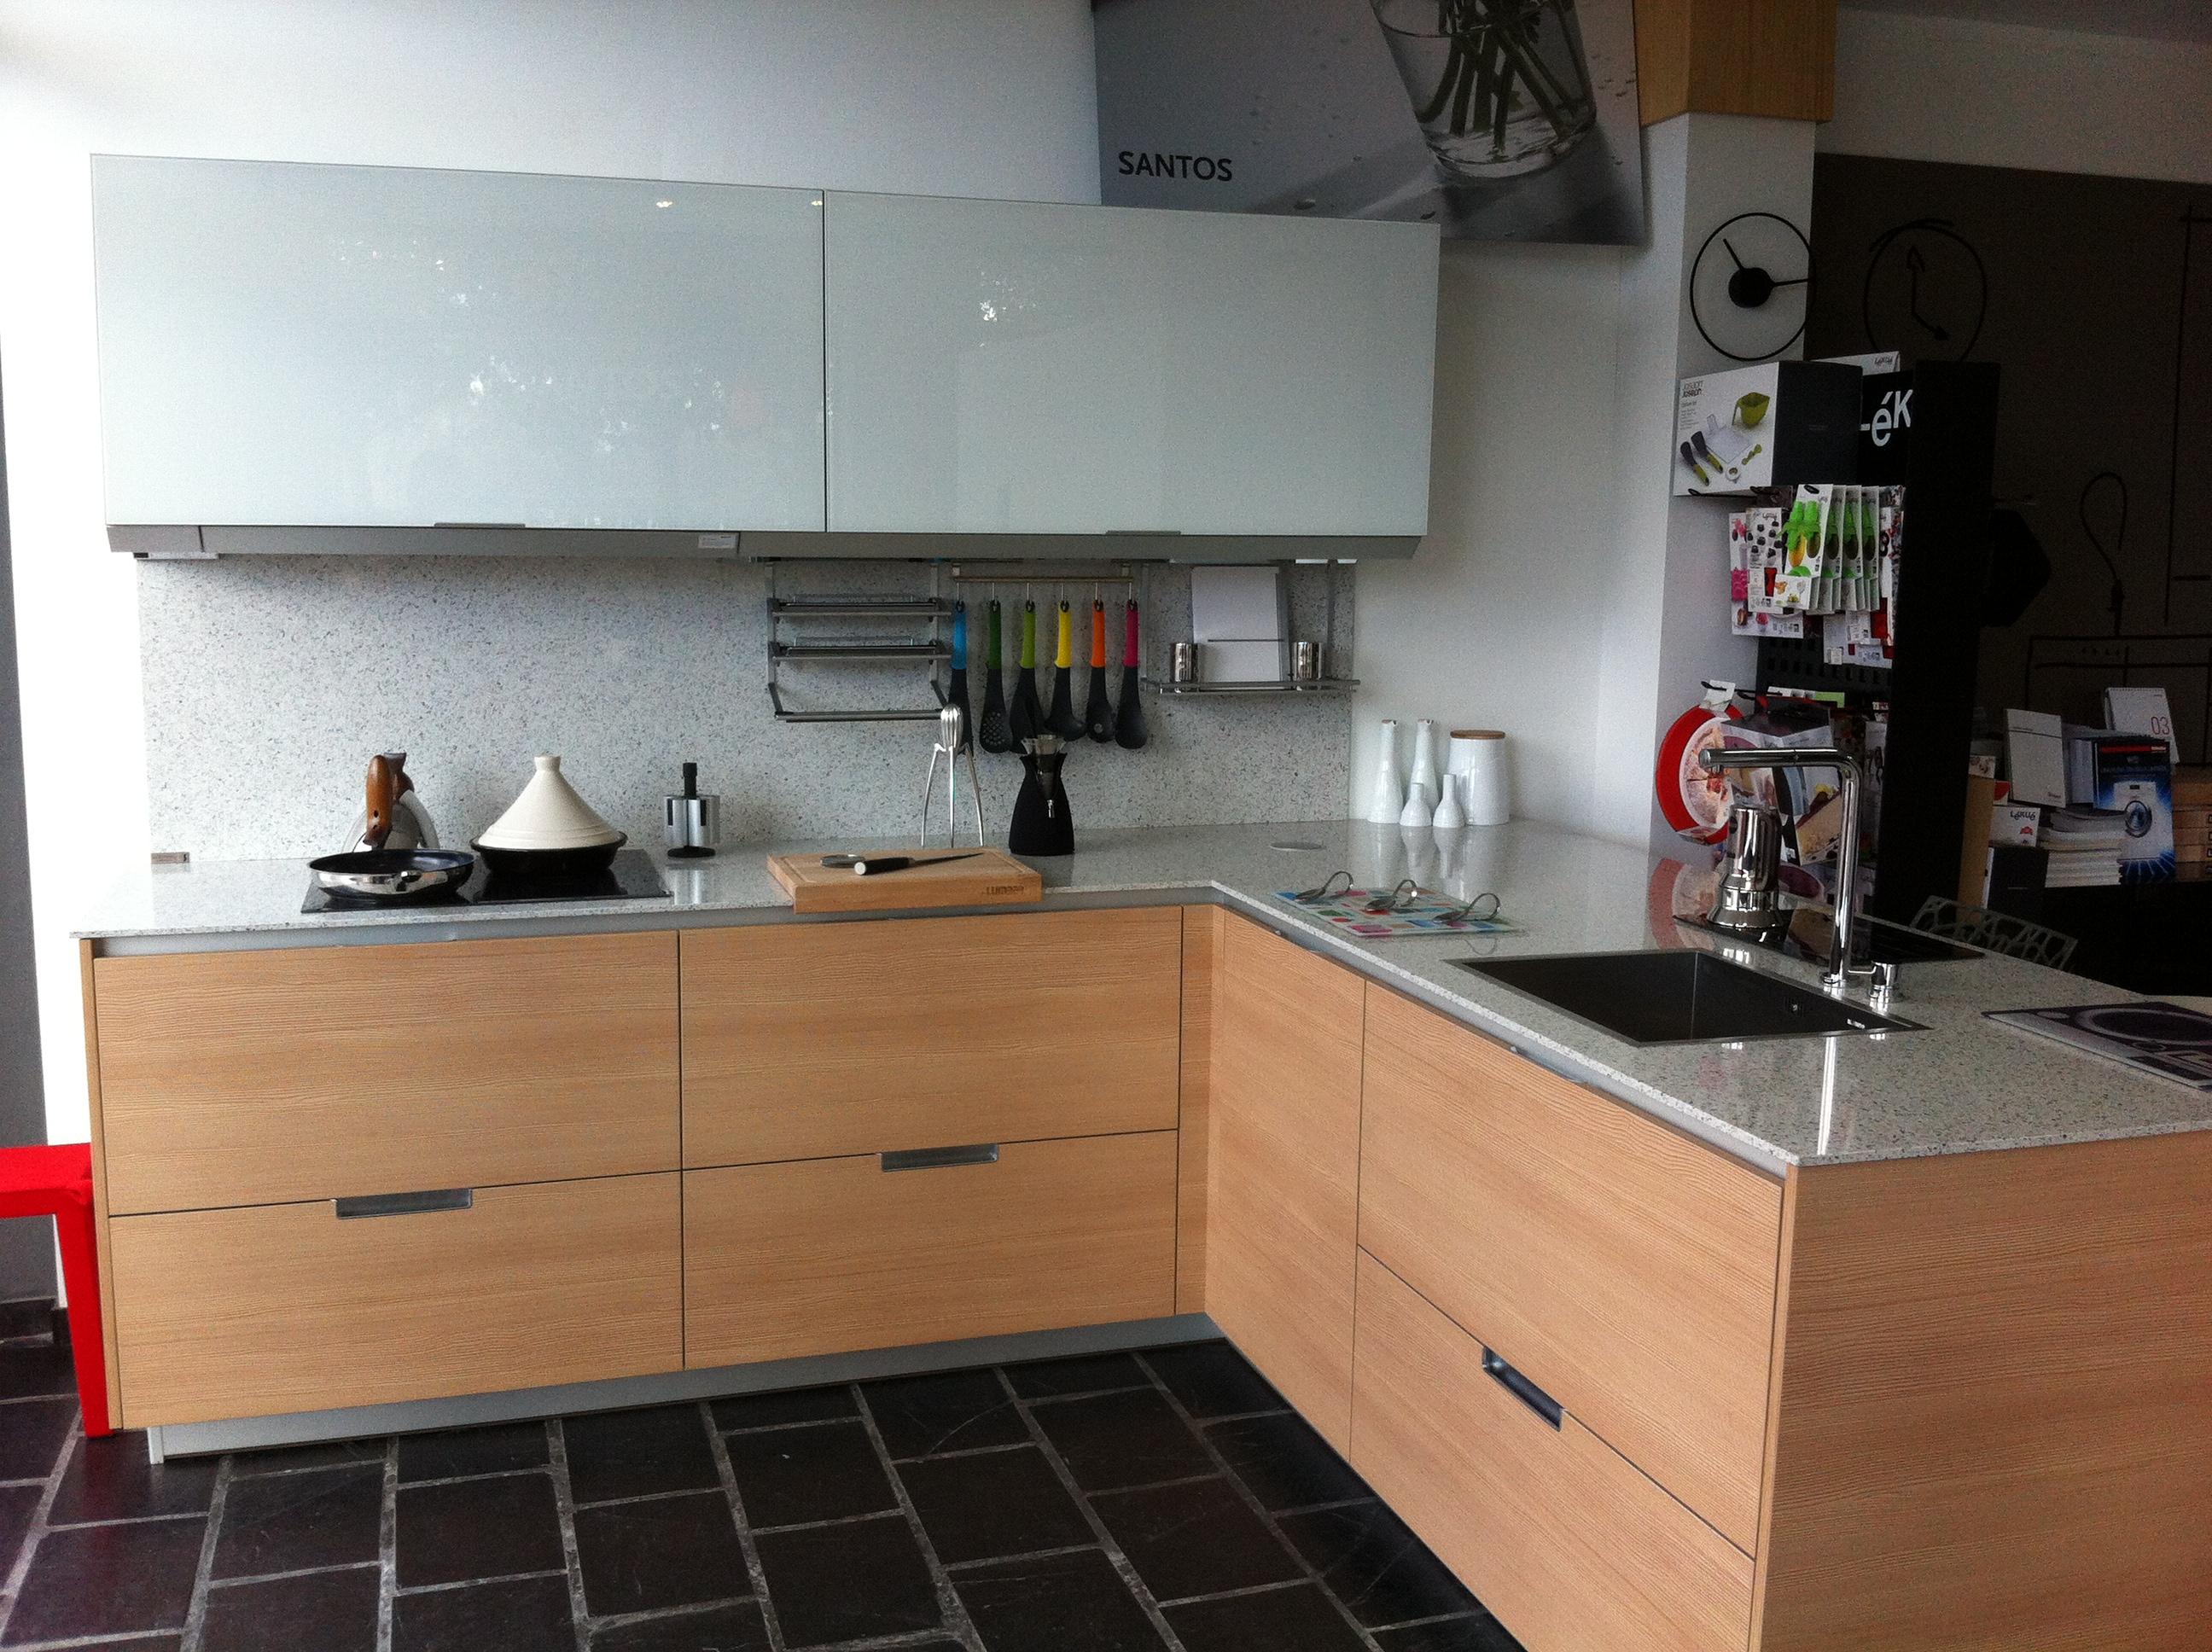 Outlet for Muebles de cocina de exposicion